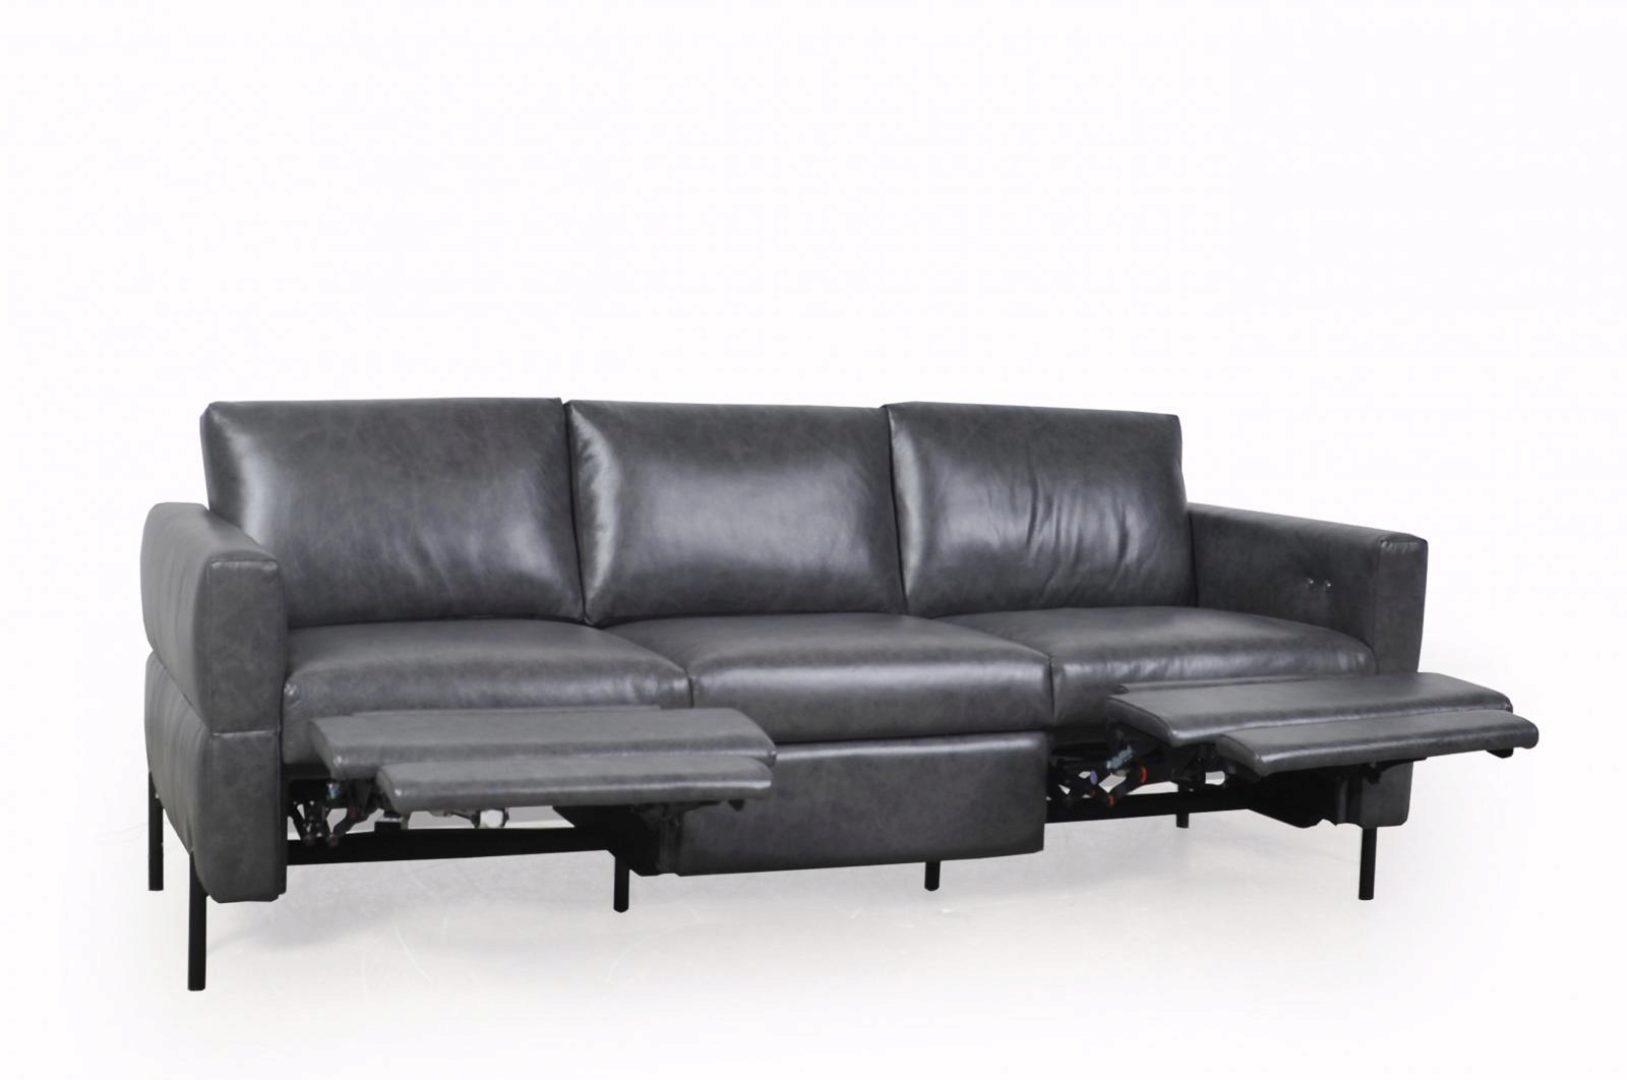 buy cheap furniture by brayden studio